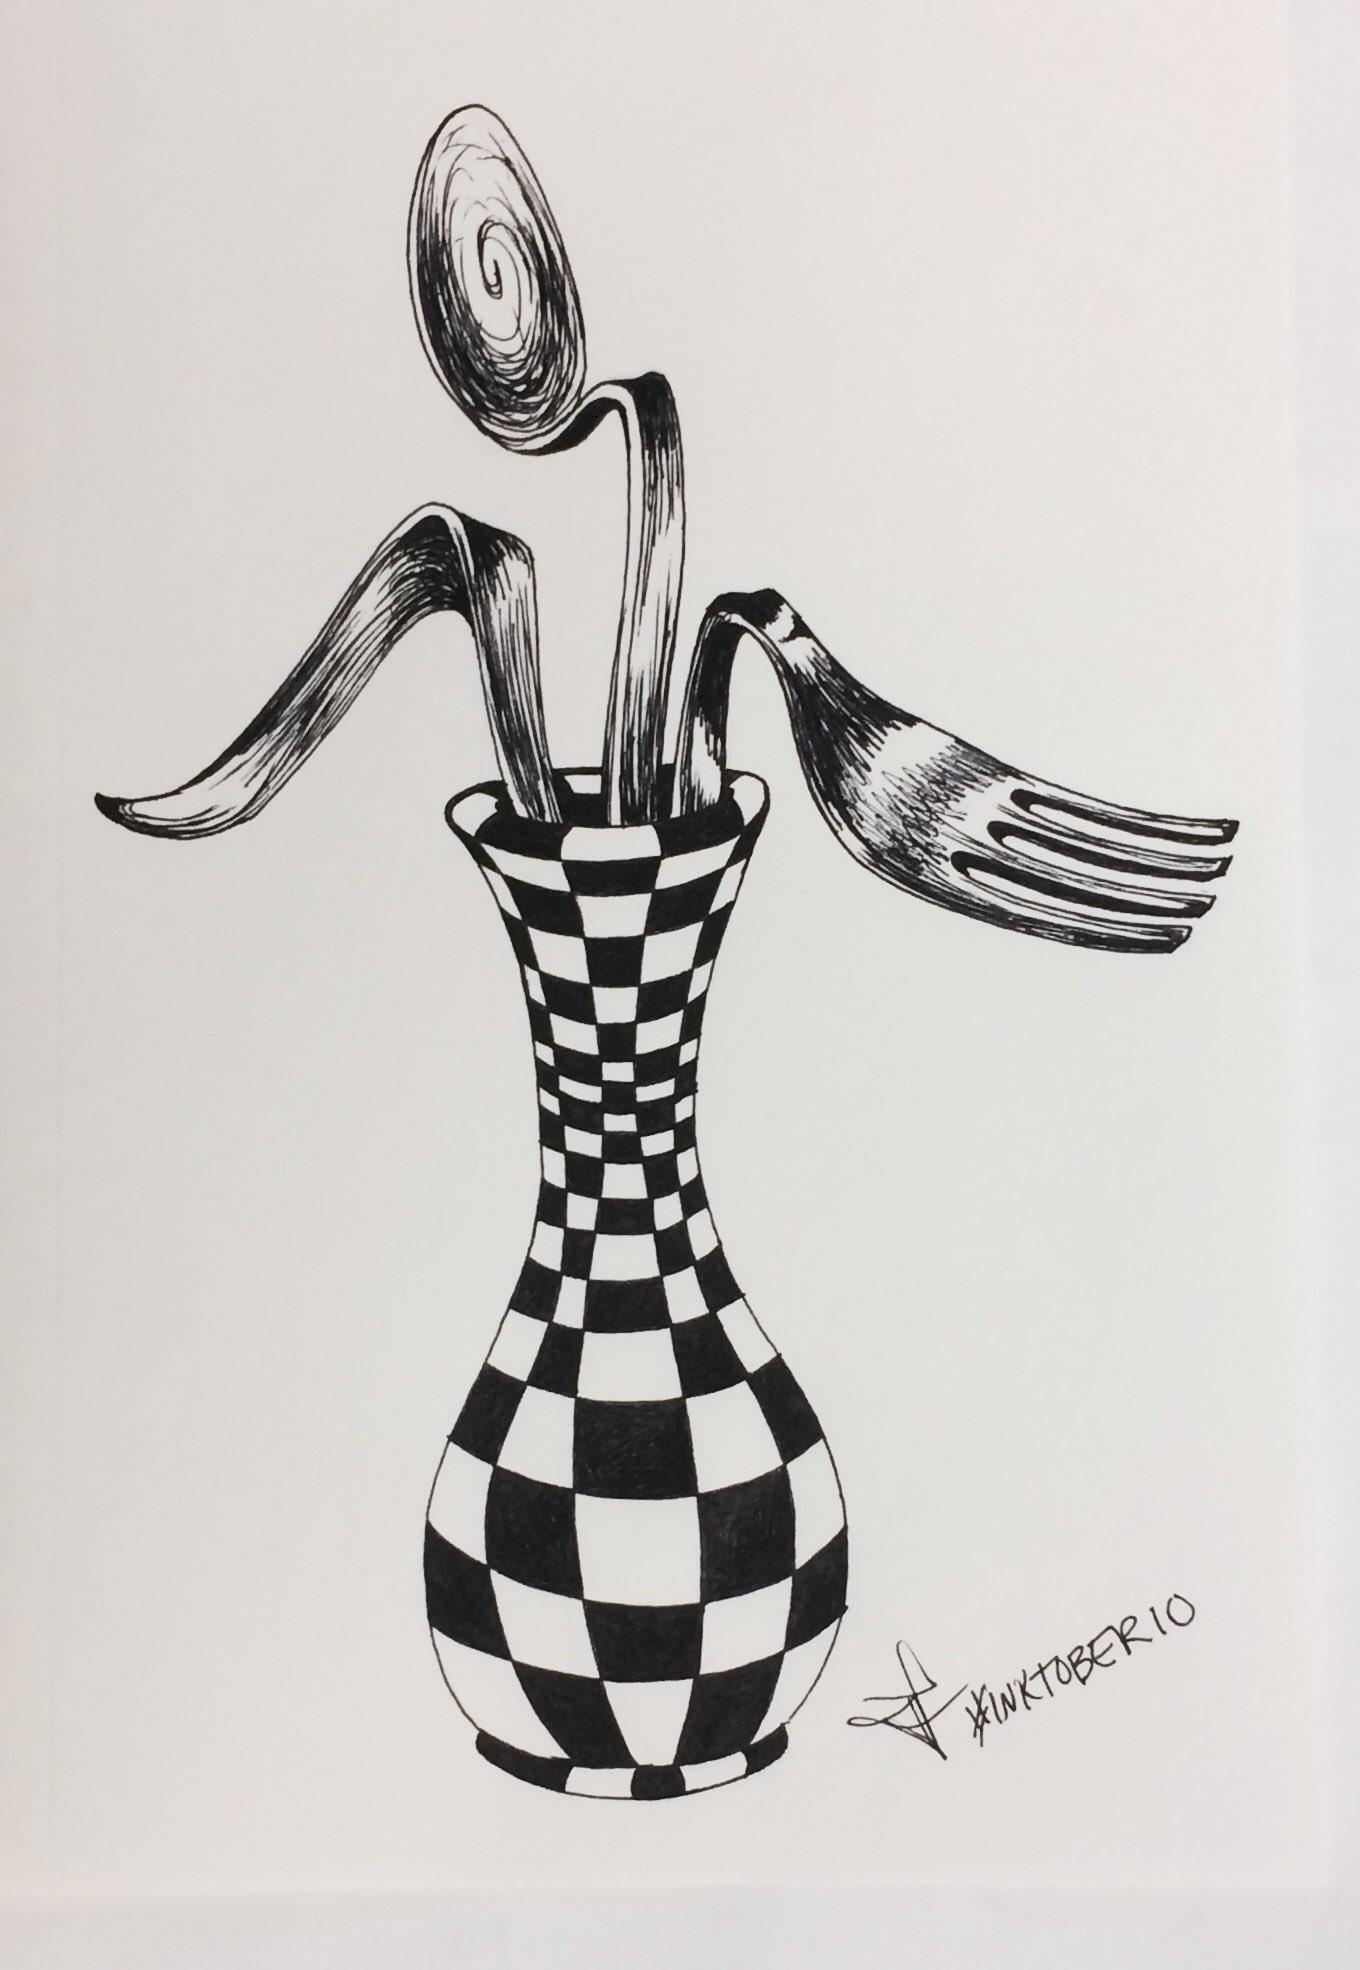 Day 10 #inktober is a silverware bouquet...#blackandwhite #surrealism #sketch https://t.co/UfMNVcMQzF